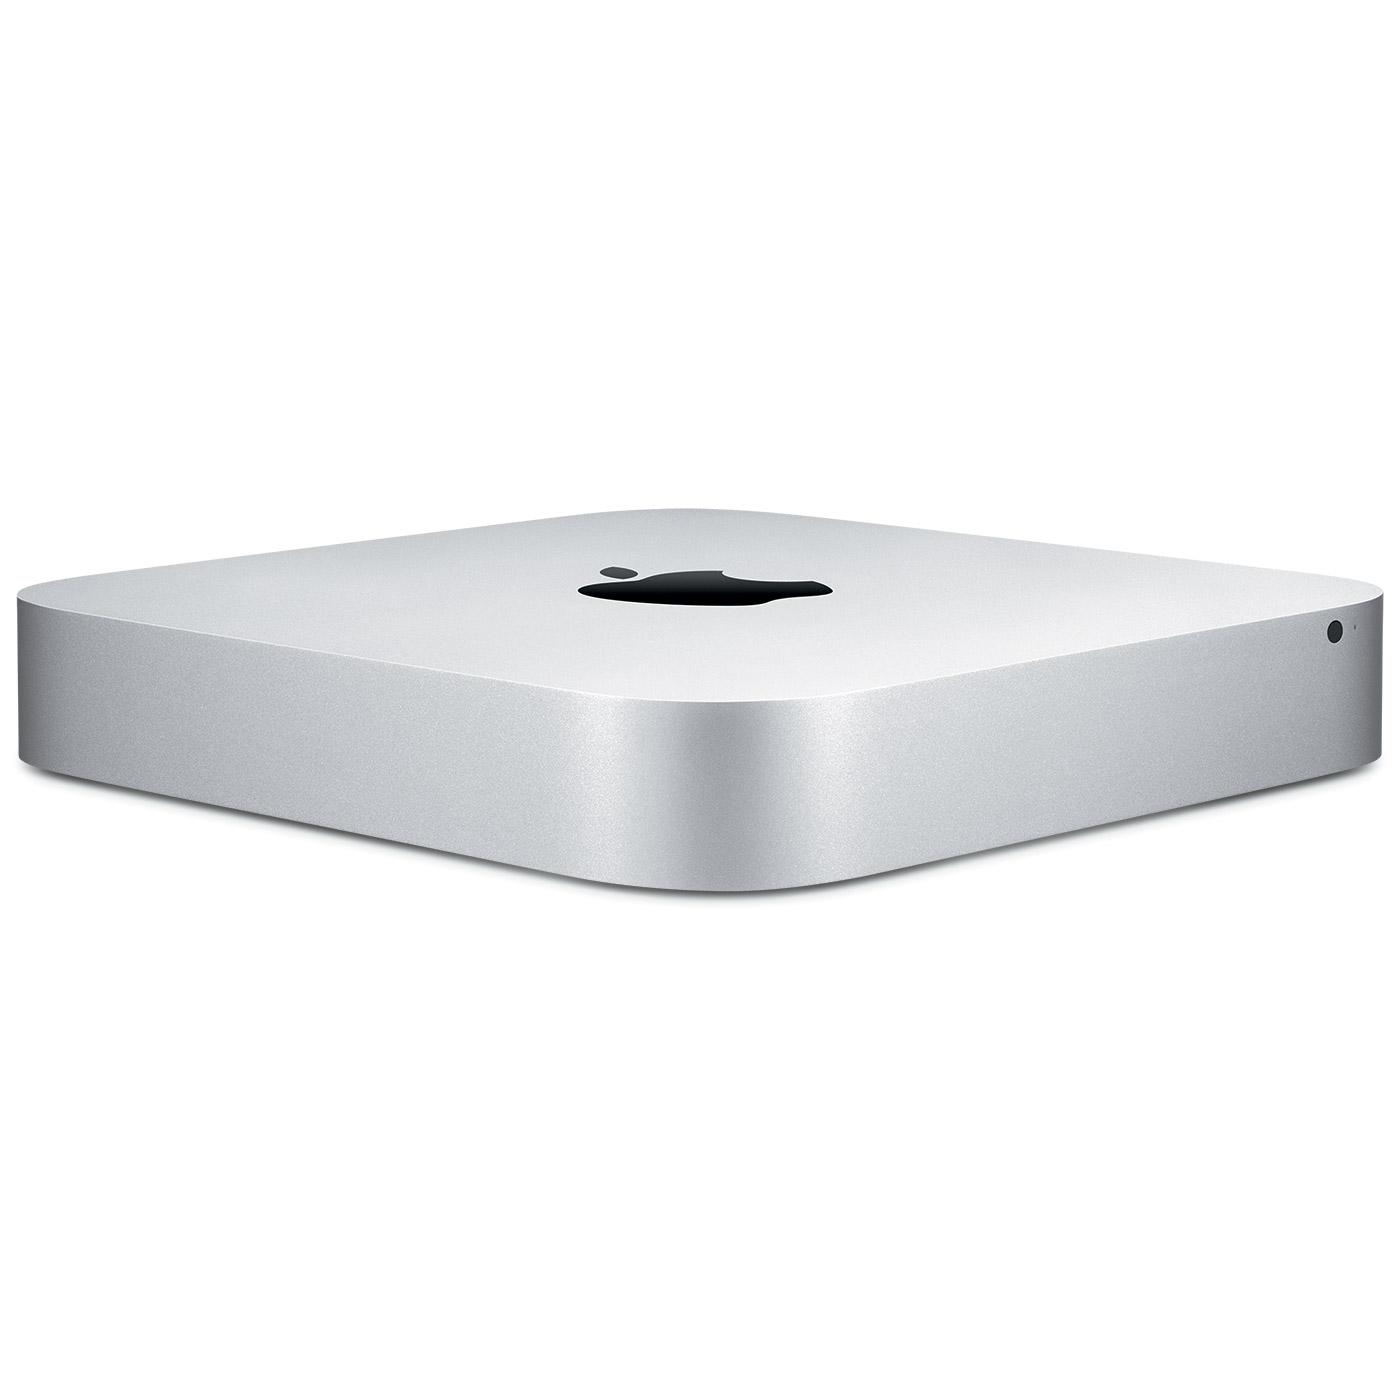 Ordinateur Mac Apple Mac Mini (MGEQ2F/A) Intel Core i5 (2.8 GHz) 8 Go 1 To Wi-Fi AC/Bluetooth Mac OS X Yosemite